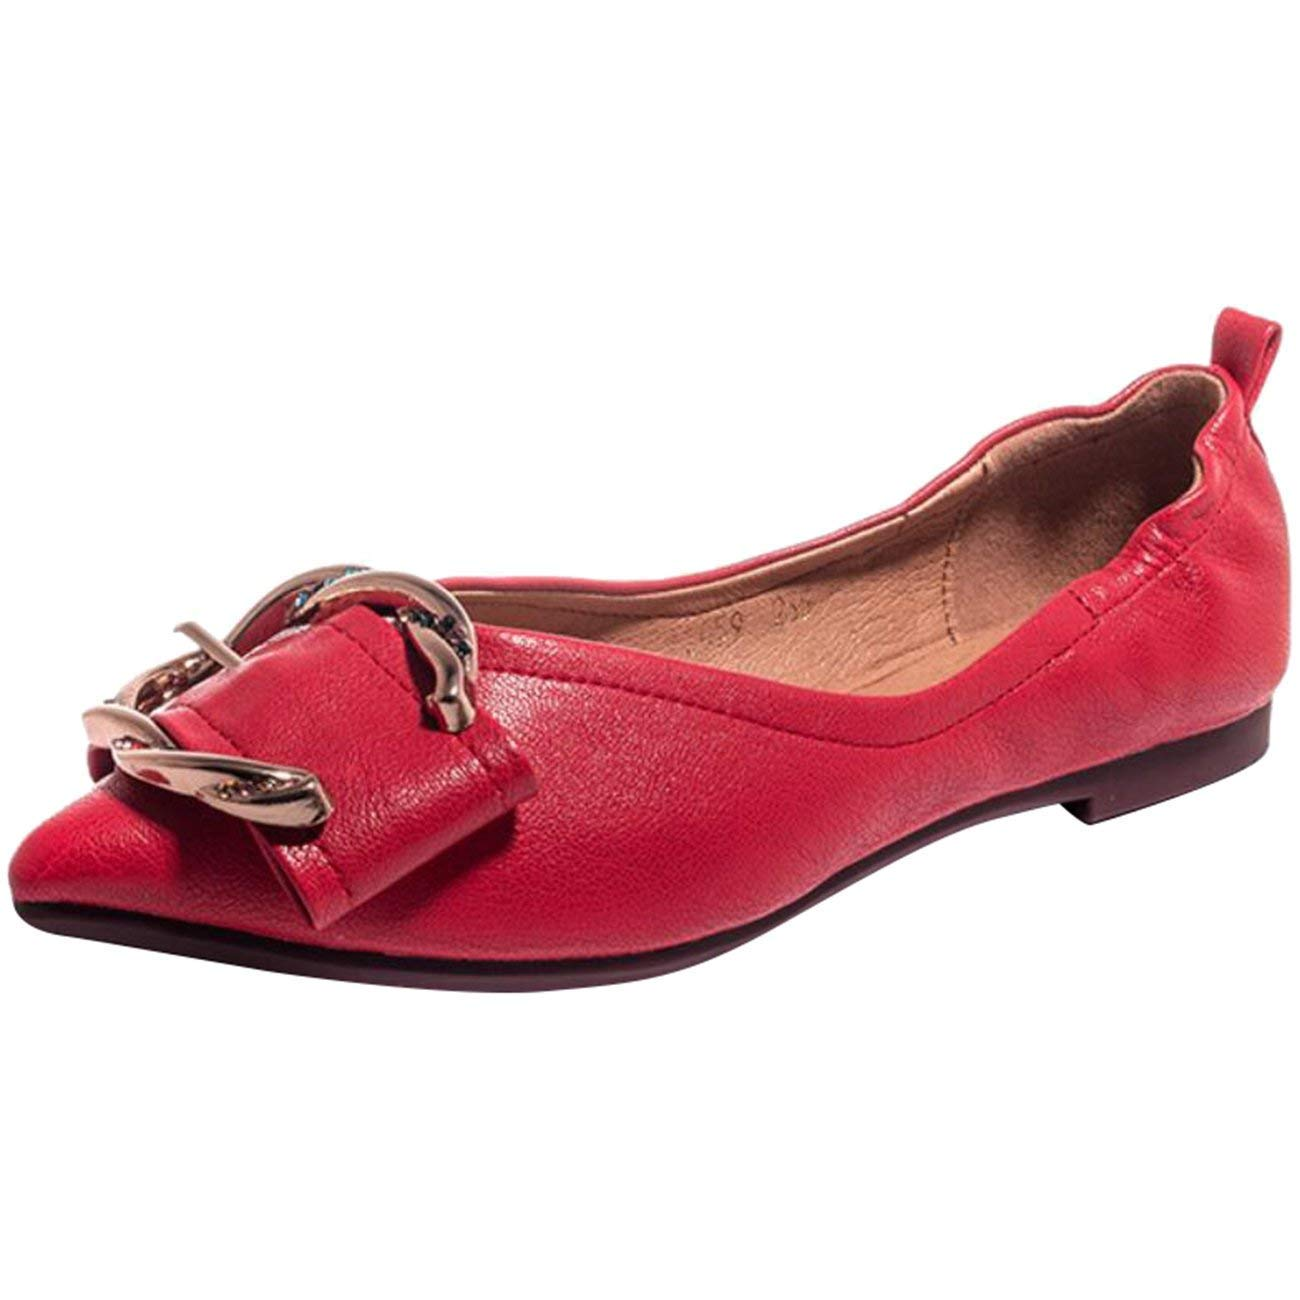 HhGold Woherren Woherren Woherren Pointed-Toe Flache Slip-on Metall Diamond Ballerinas (Farbe   Rot Größe   5 UK) aa6da2